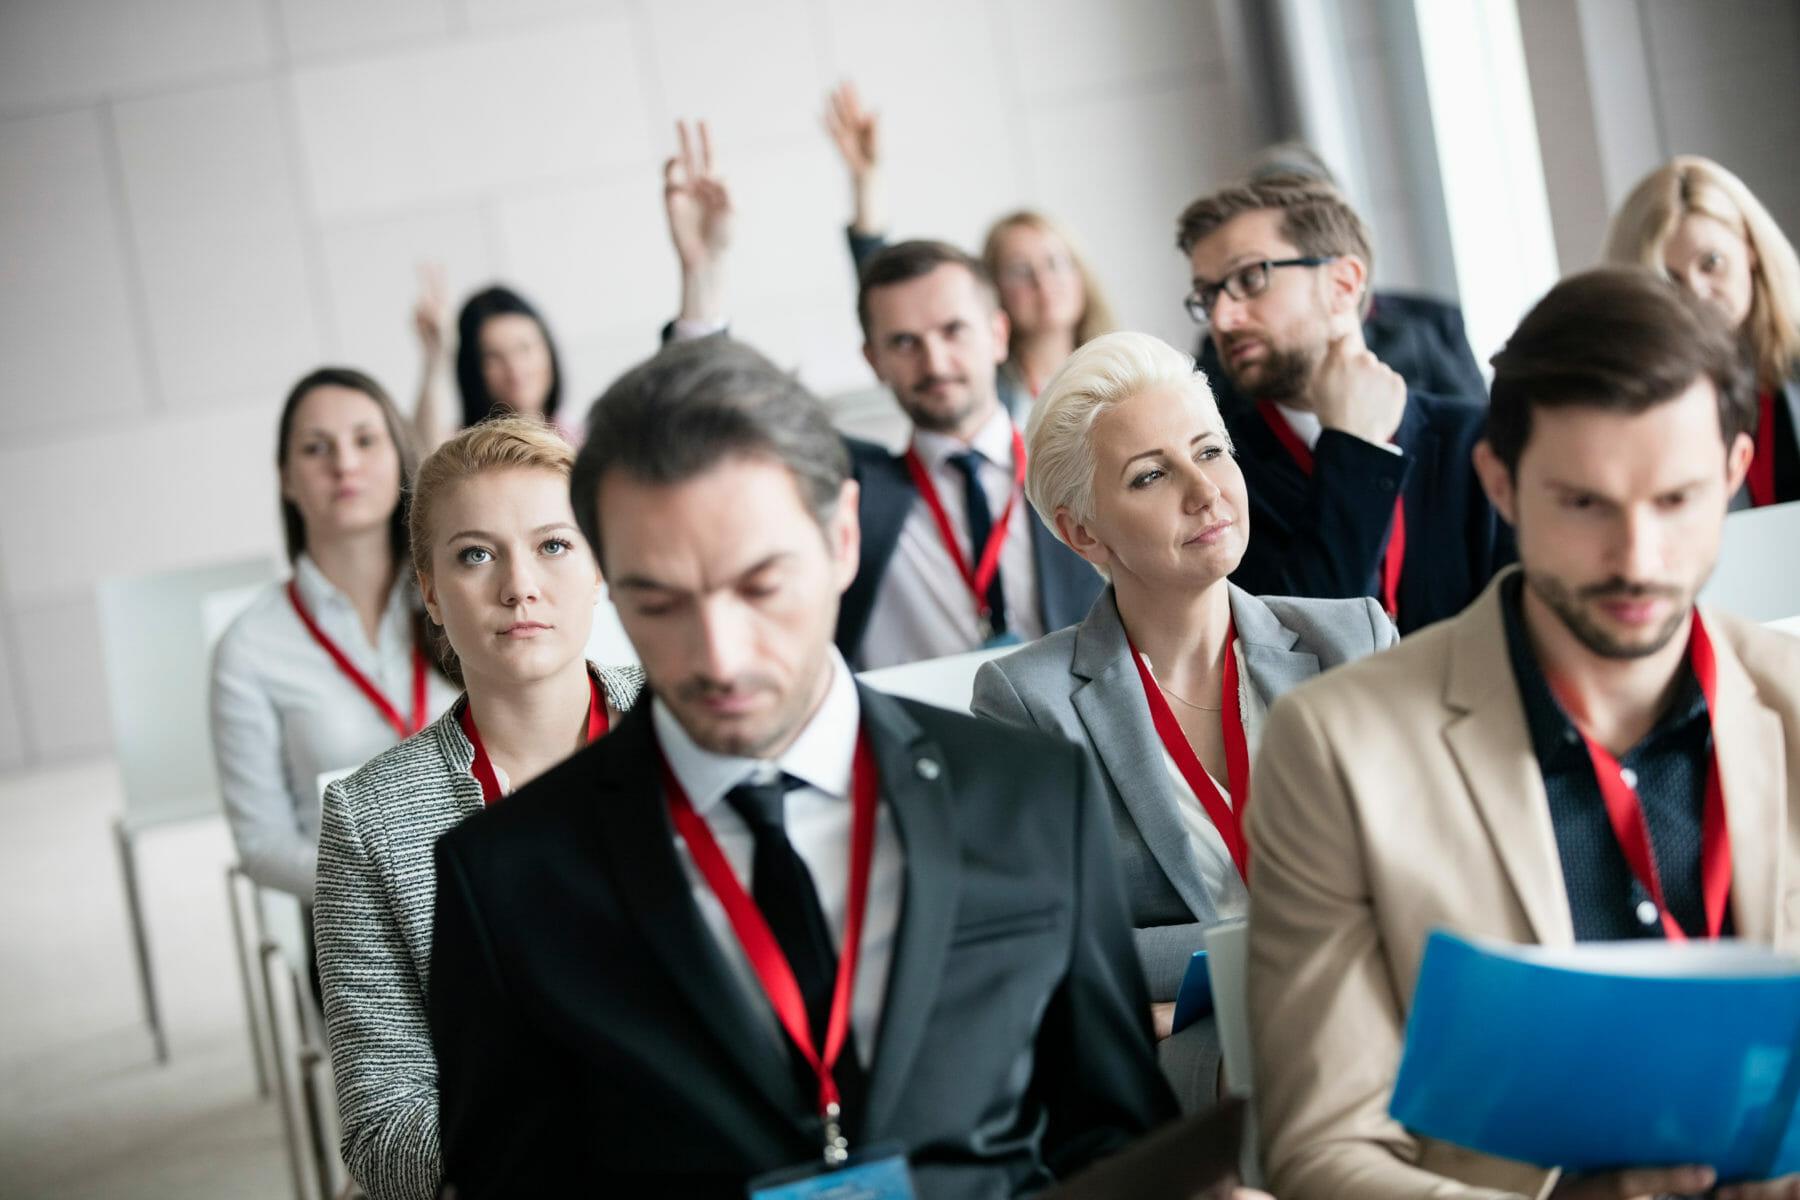 List of Real Estate Professional Associations & Organizations - Job Seekers Blog - JobStars Resume Writing and Career Coaching